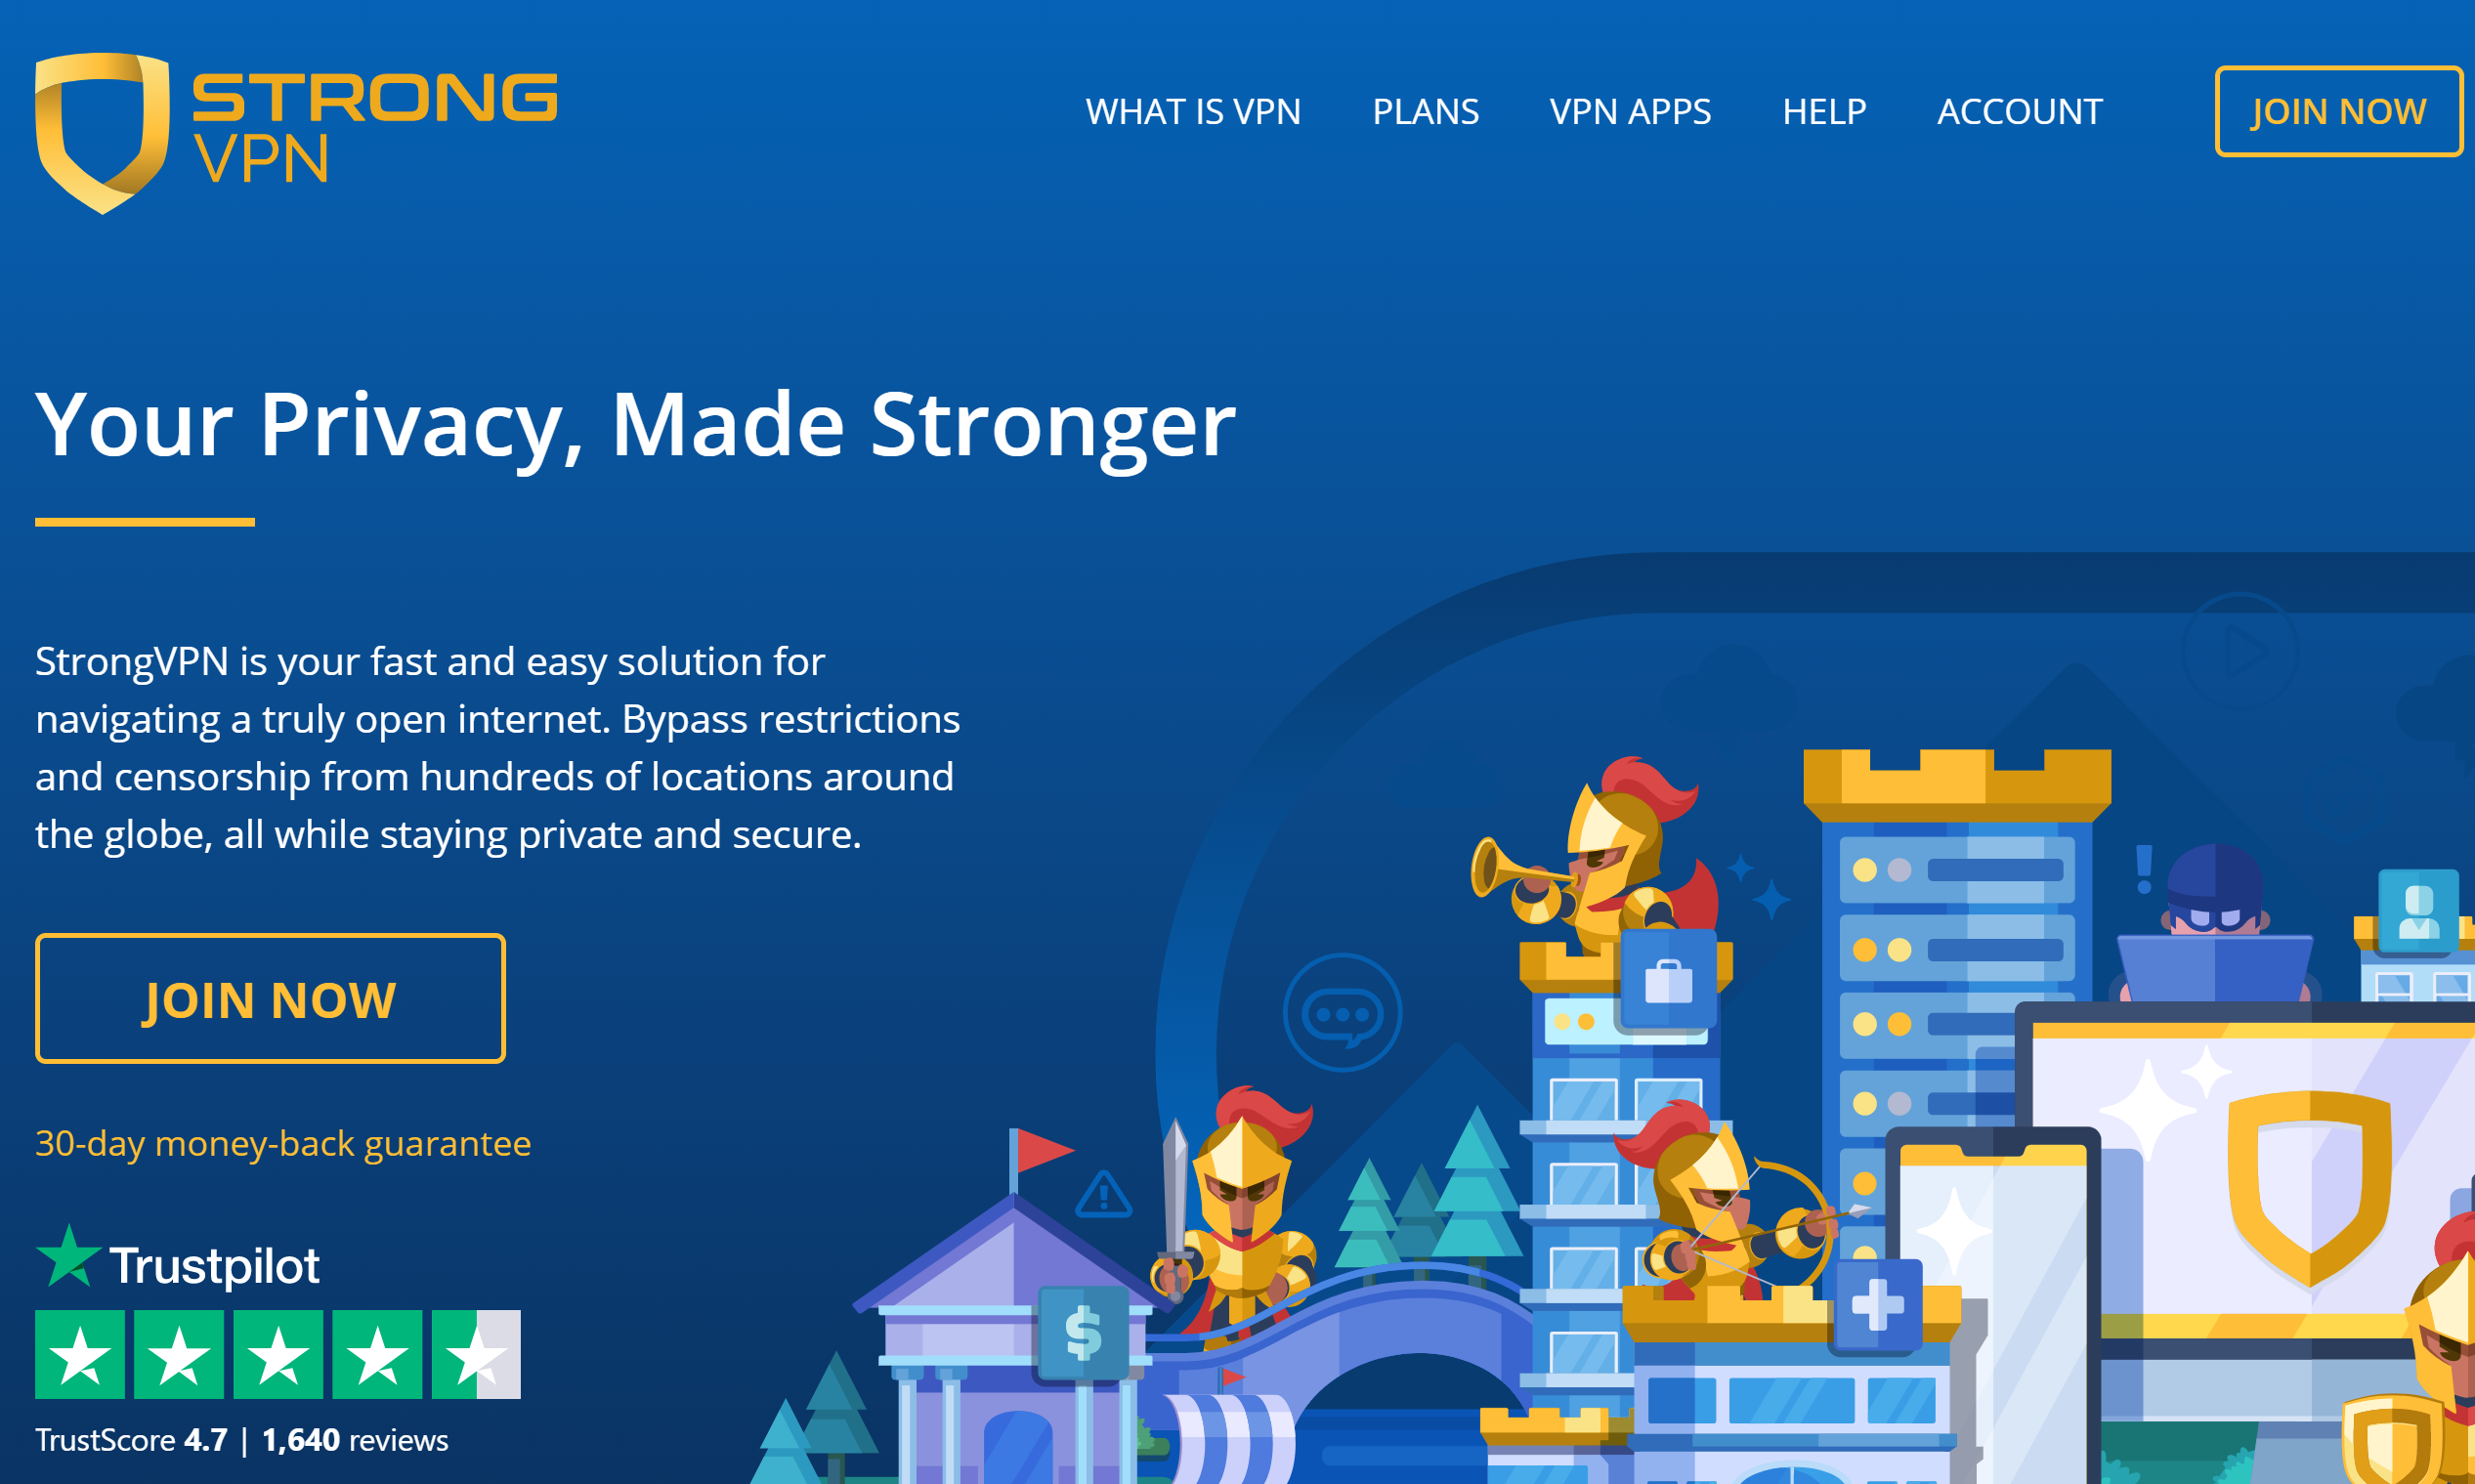 StrongVPN Homepage